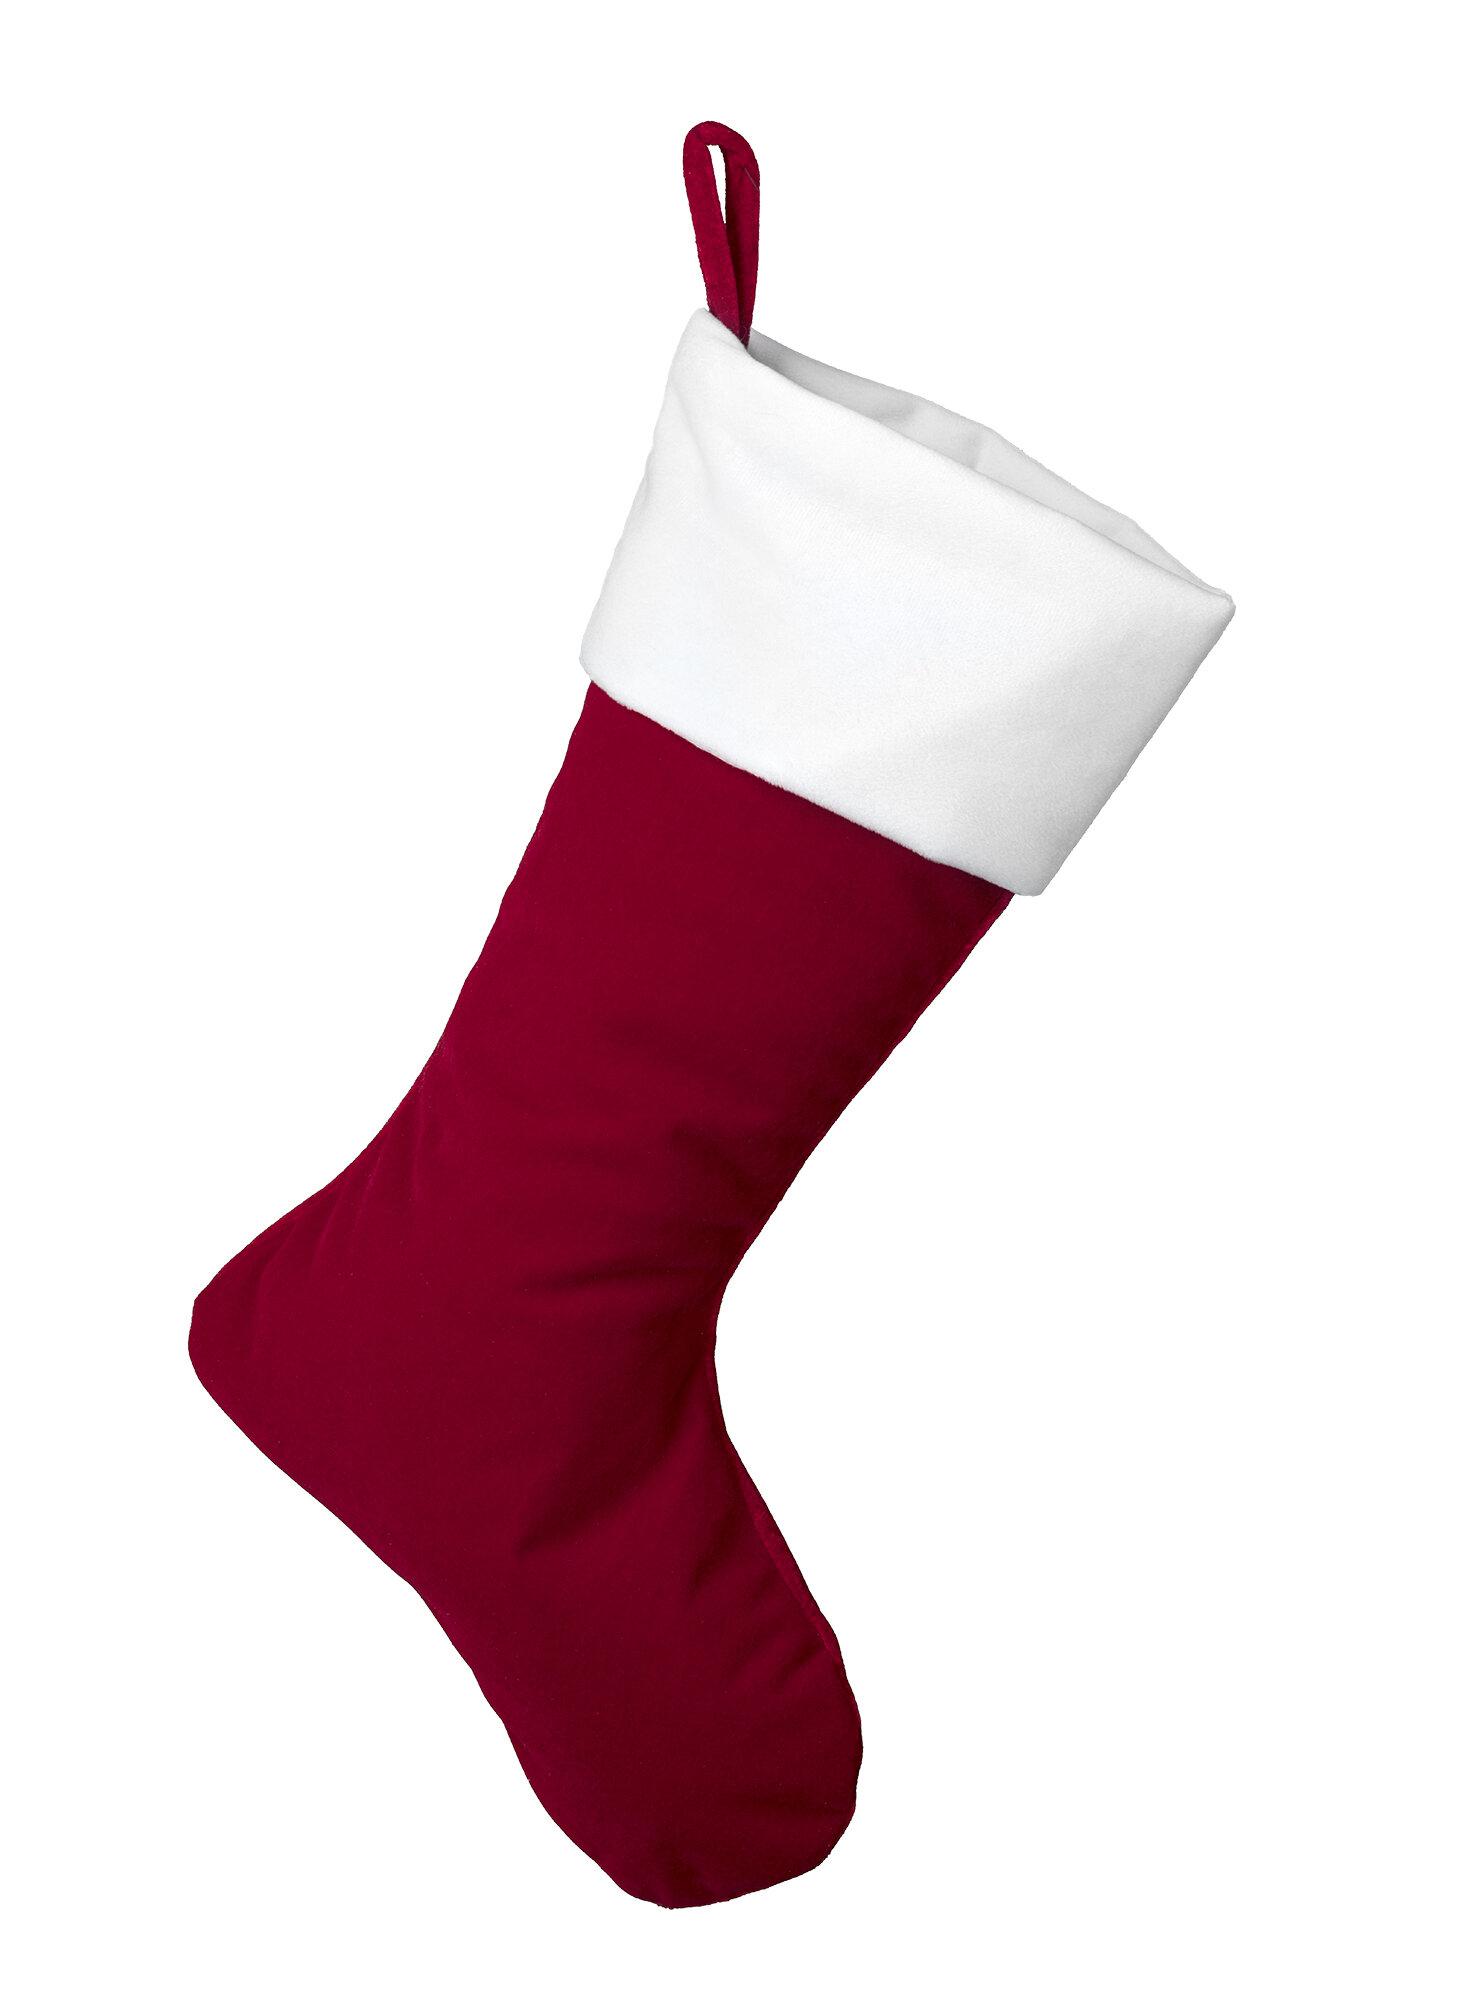 Haute Decor Hangright 4 Deluxe Christmas Stocking Reviews Wayfair